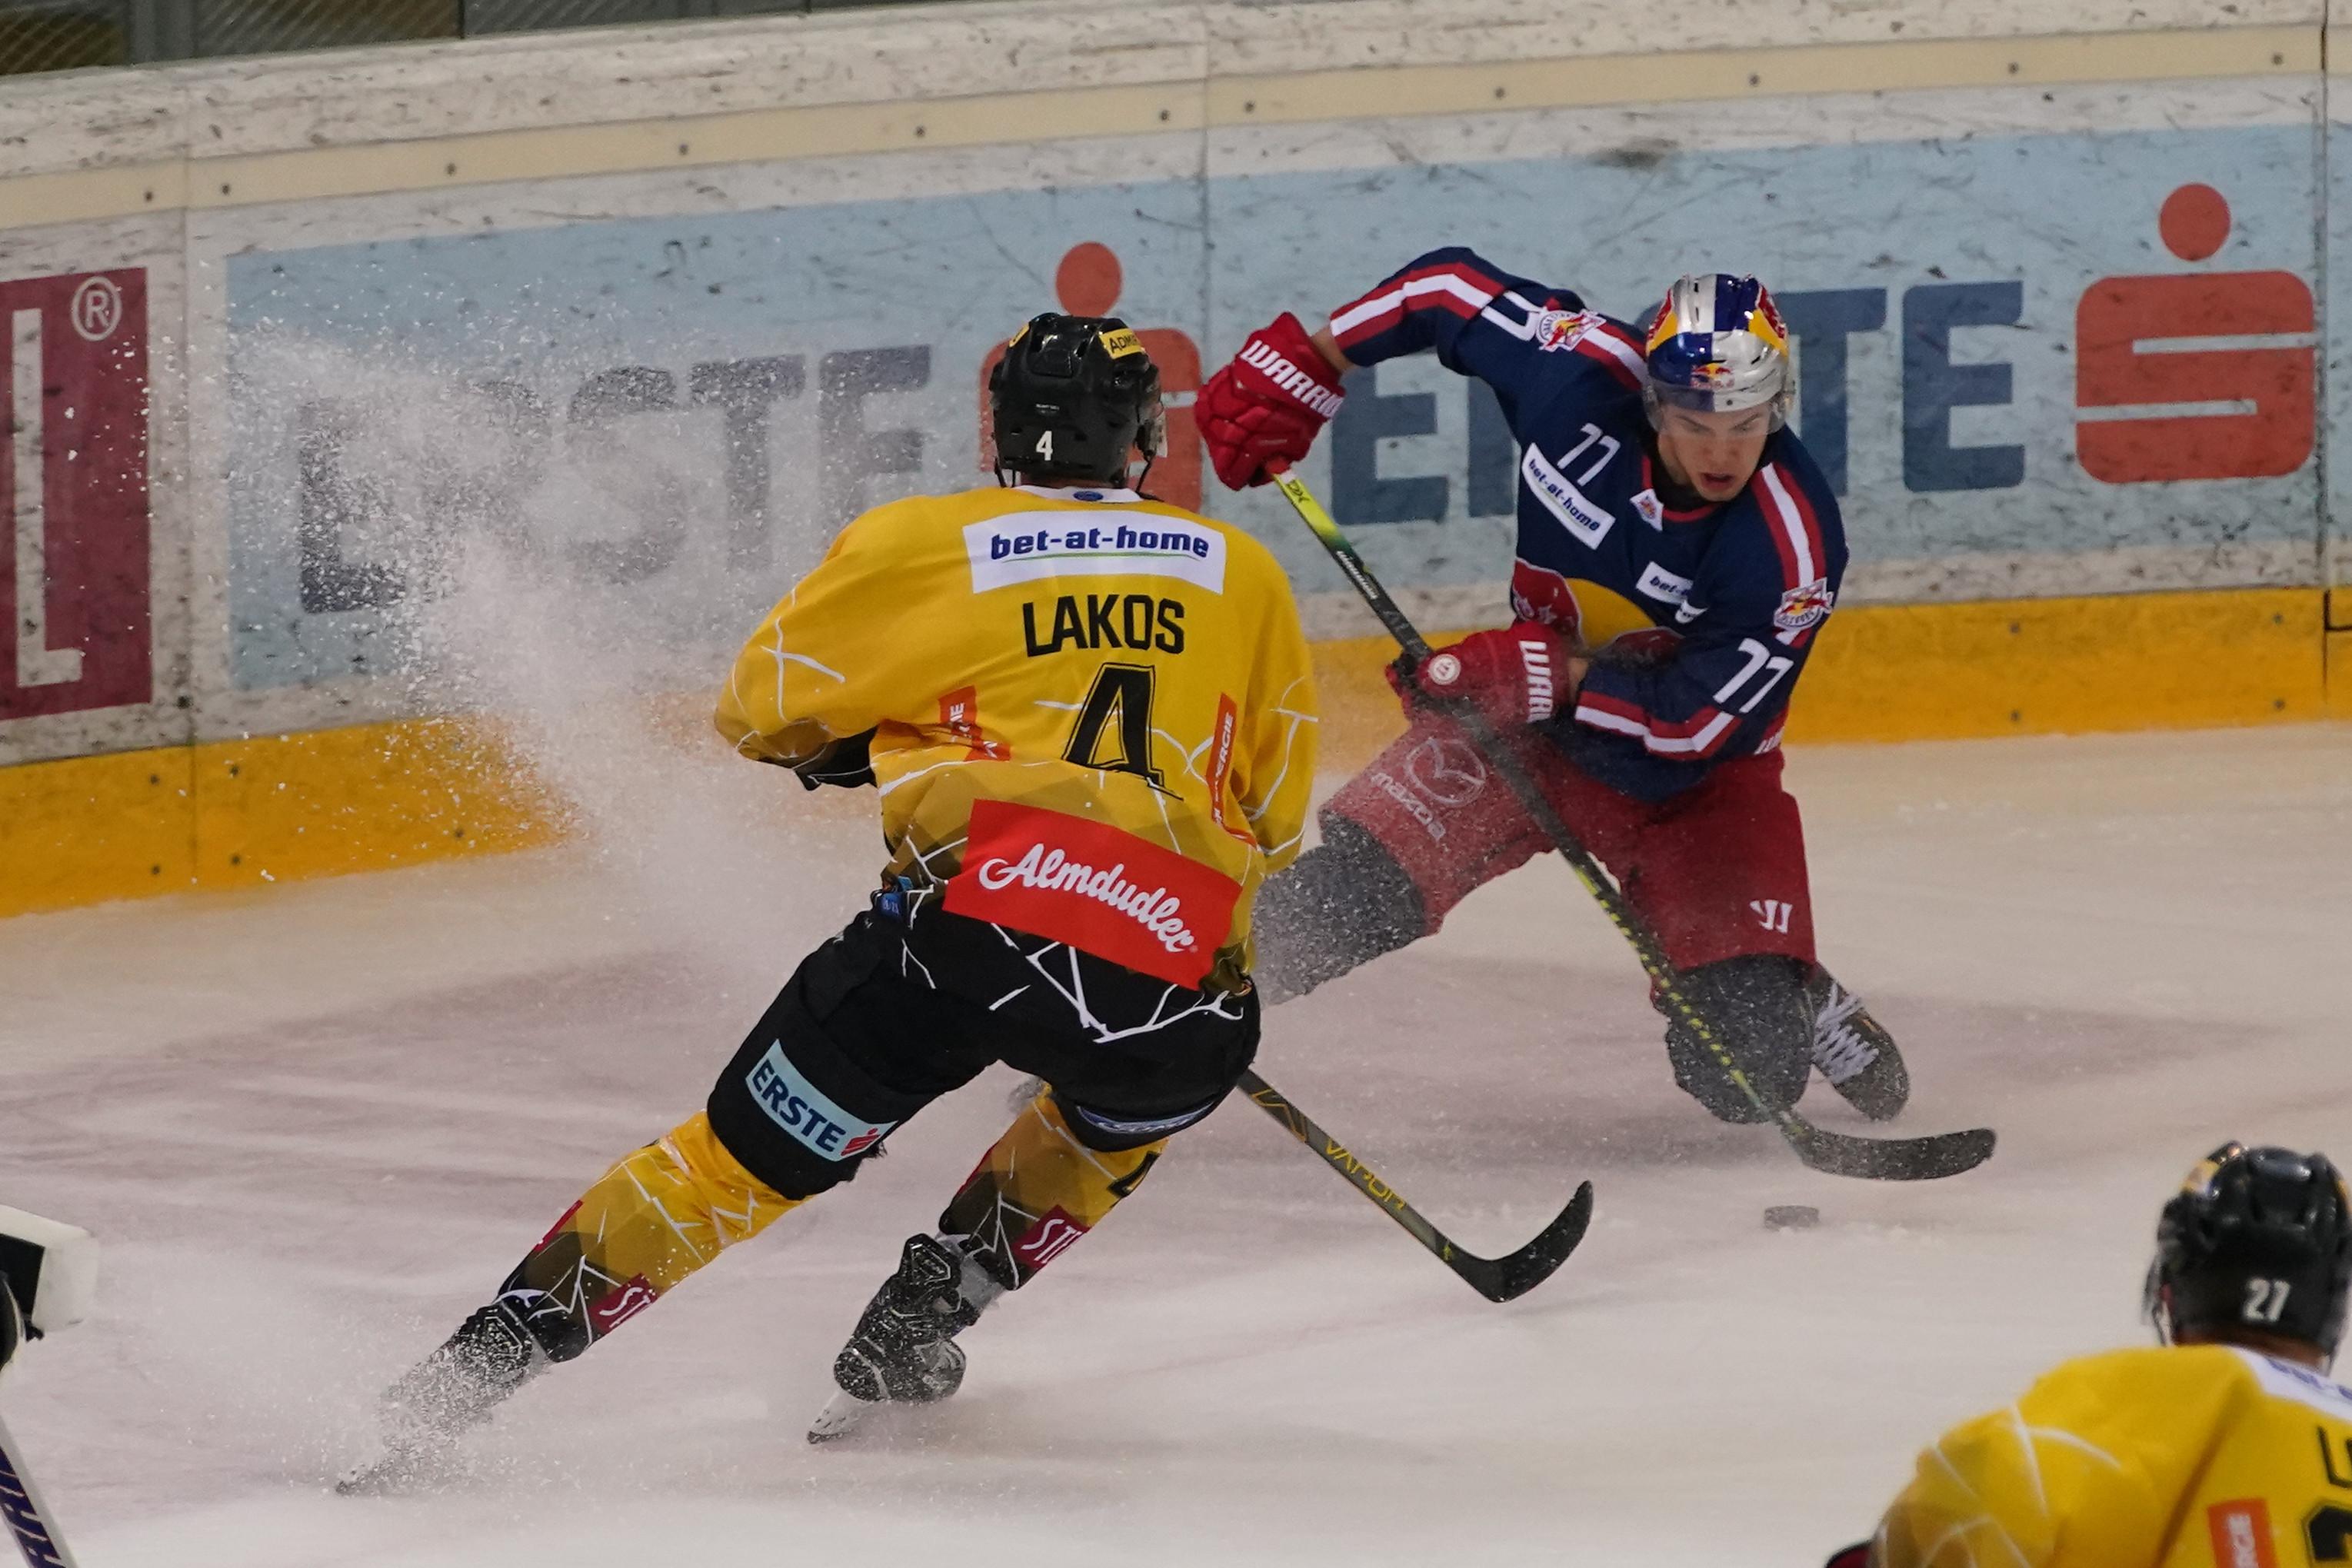 Vienna Capitals v EC Red Bull Salzburg - Bet-at-home Ice Hockey League